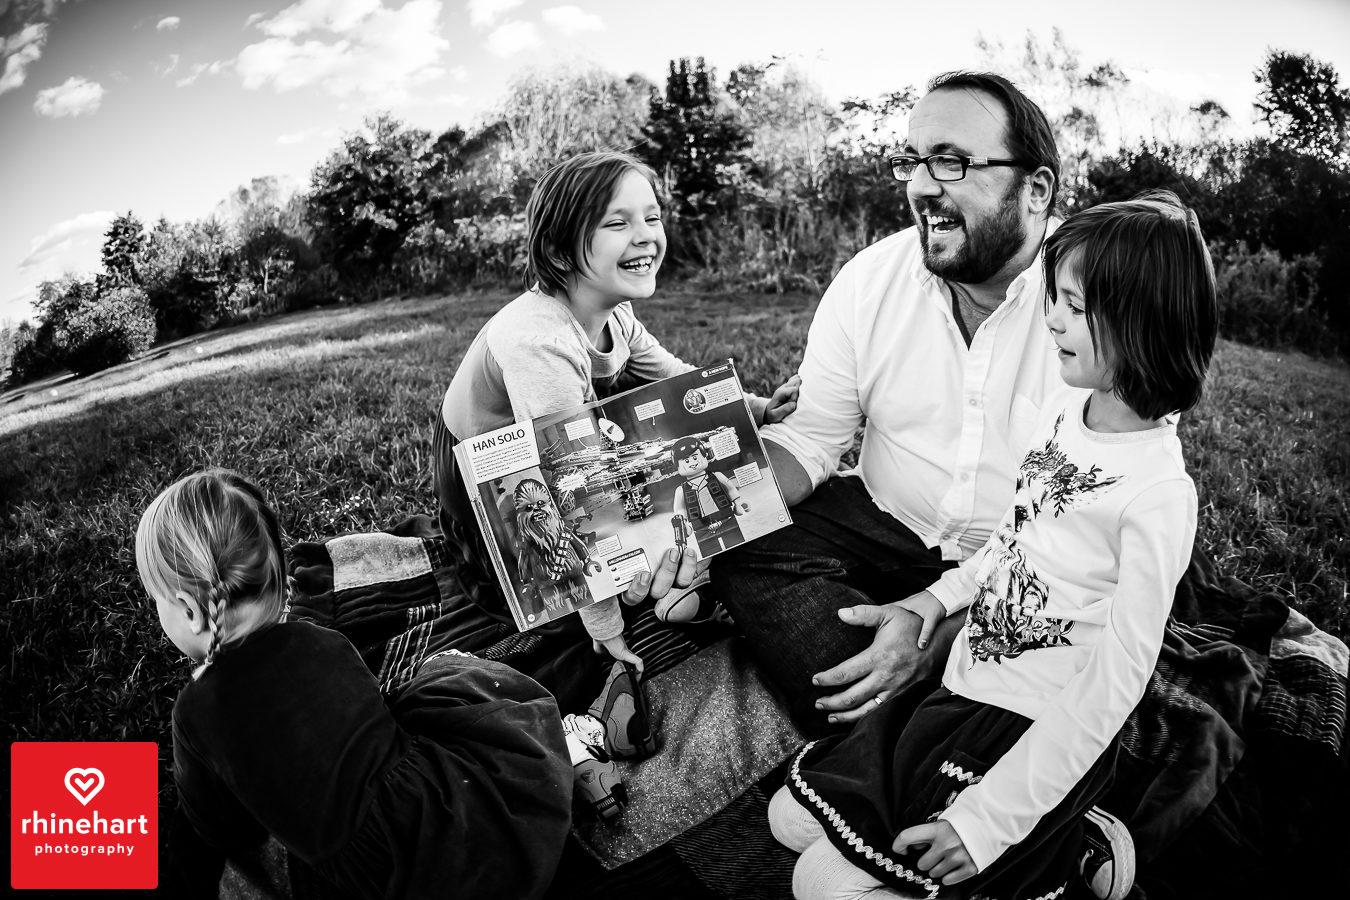 central-pa-pennsylvania-family-portrait-photographers-creative-unique-vibrant-colorful-16